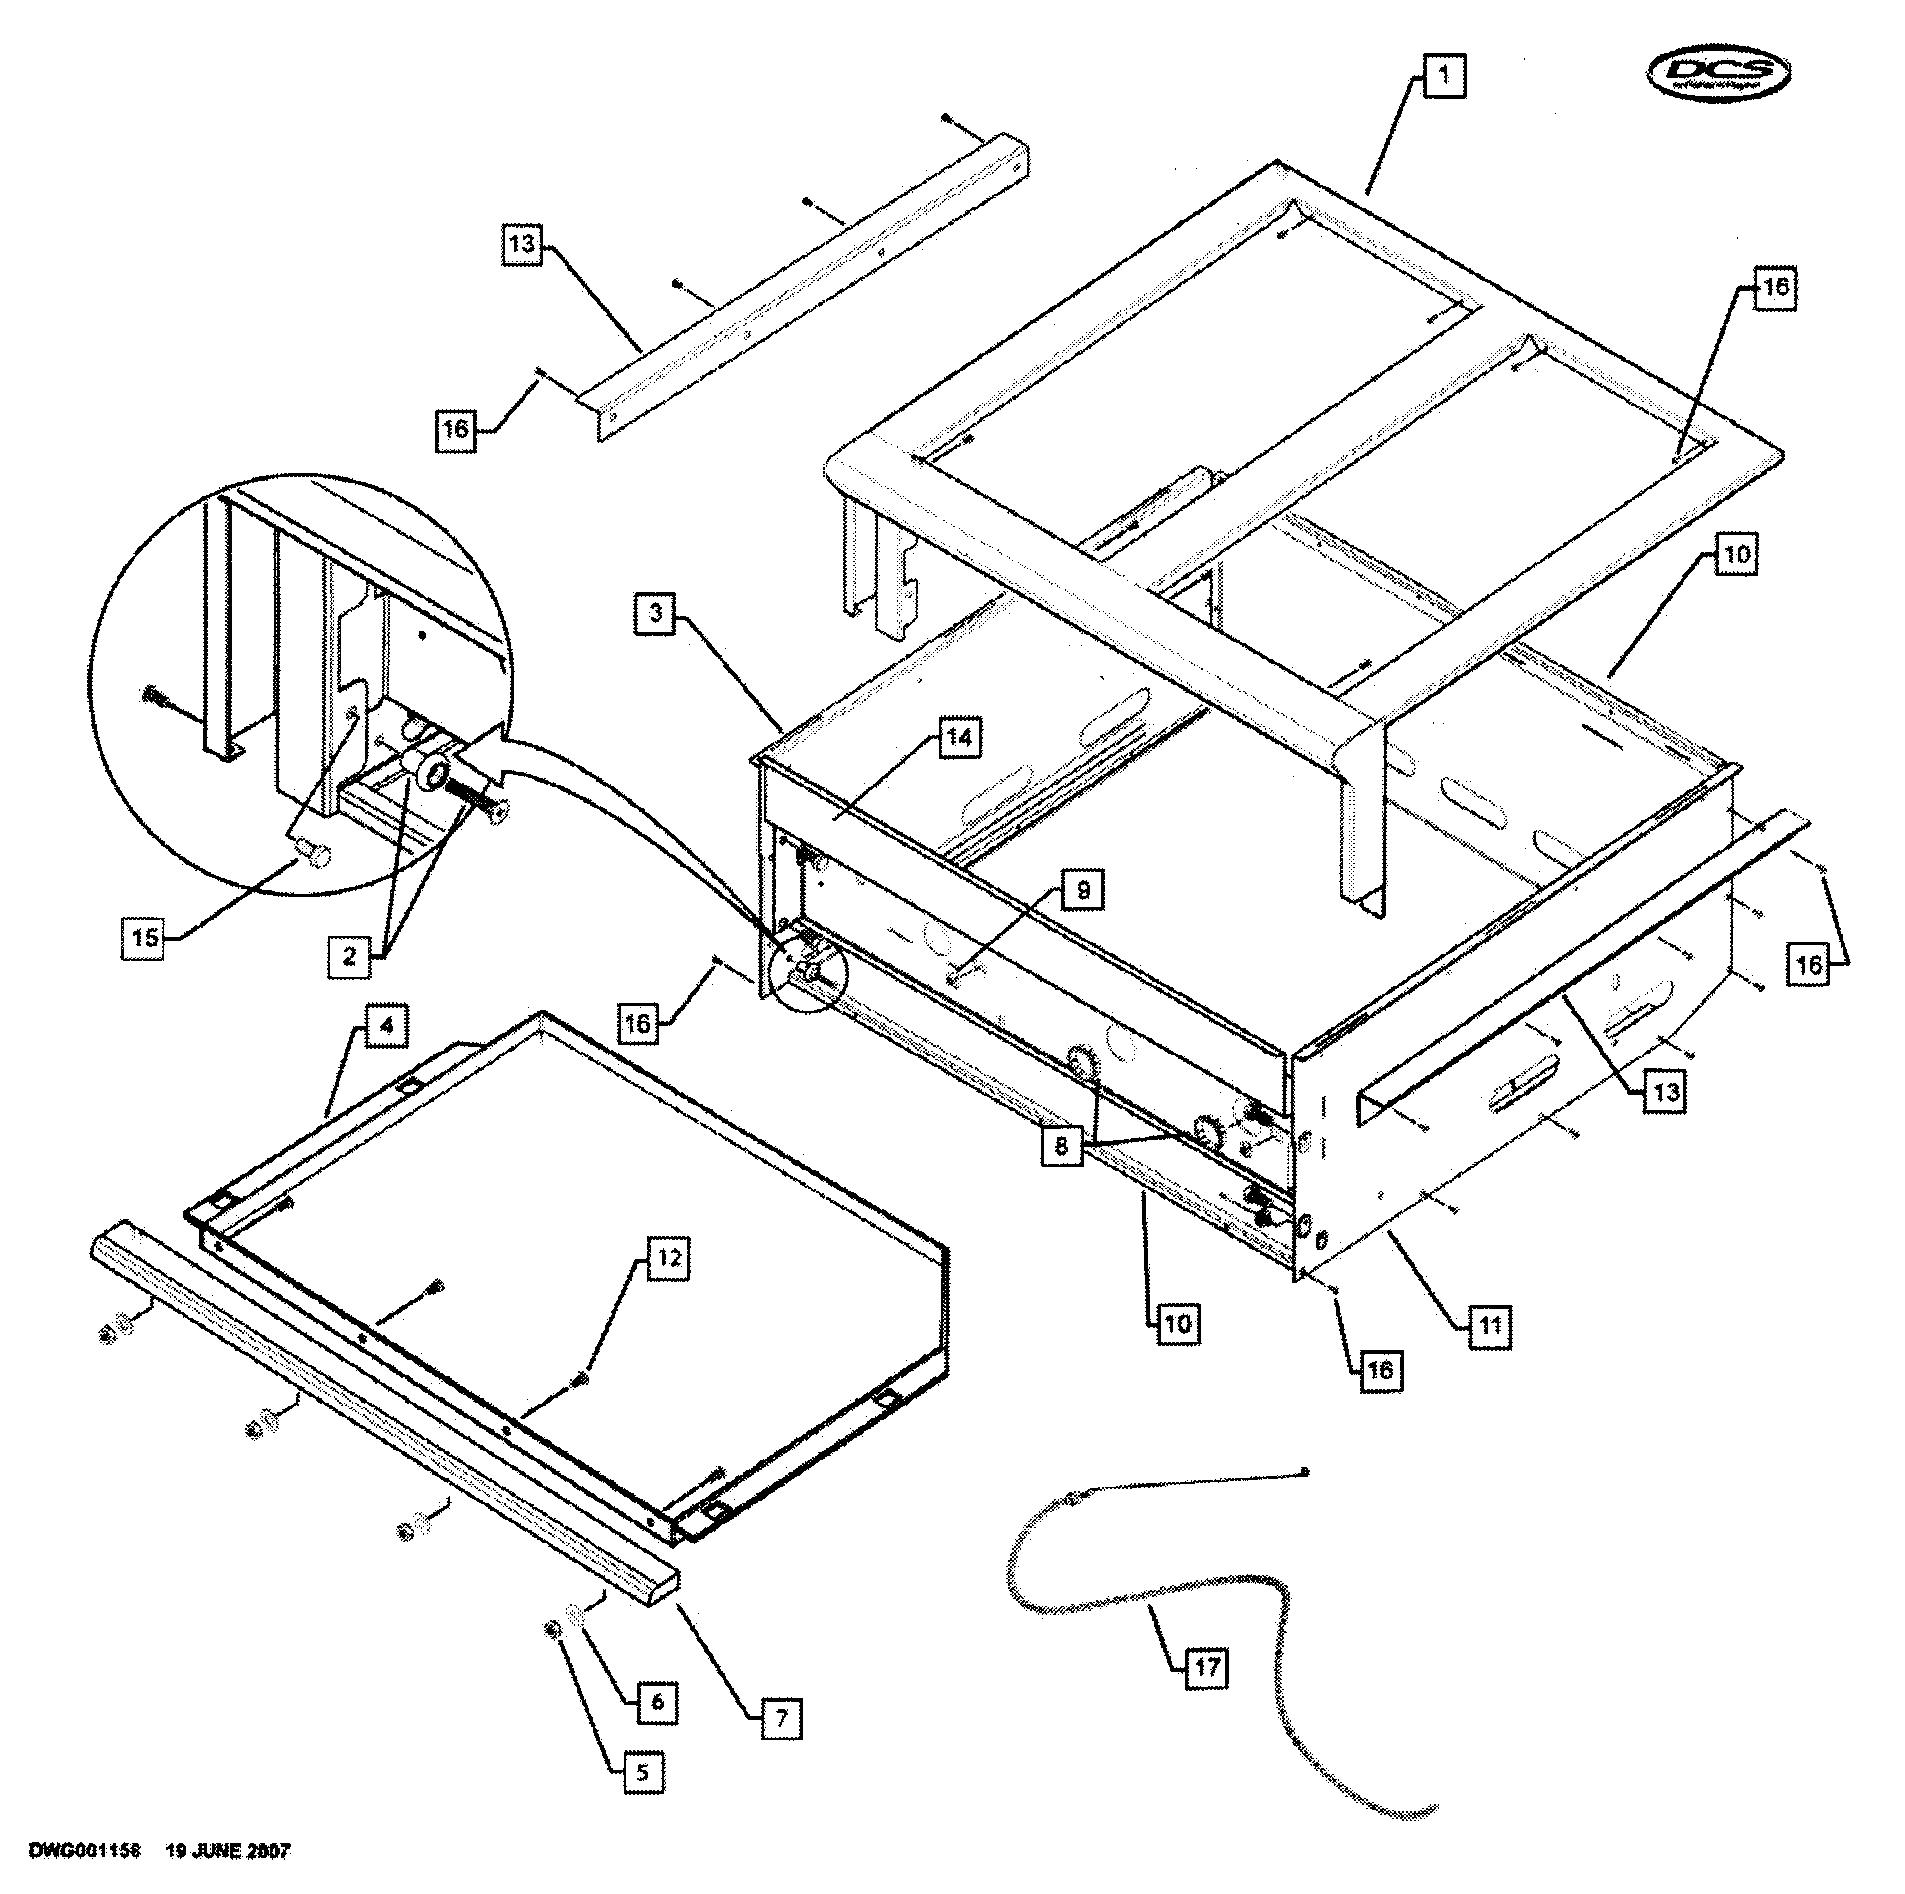 Hobart 250 Parts Diagram Free Wiring For You Welder Imageresizertool Com Dishwasher